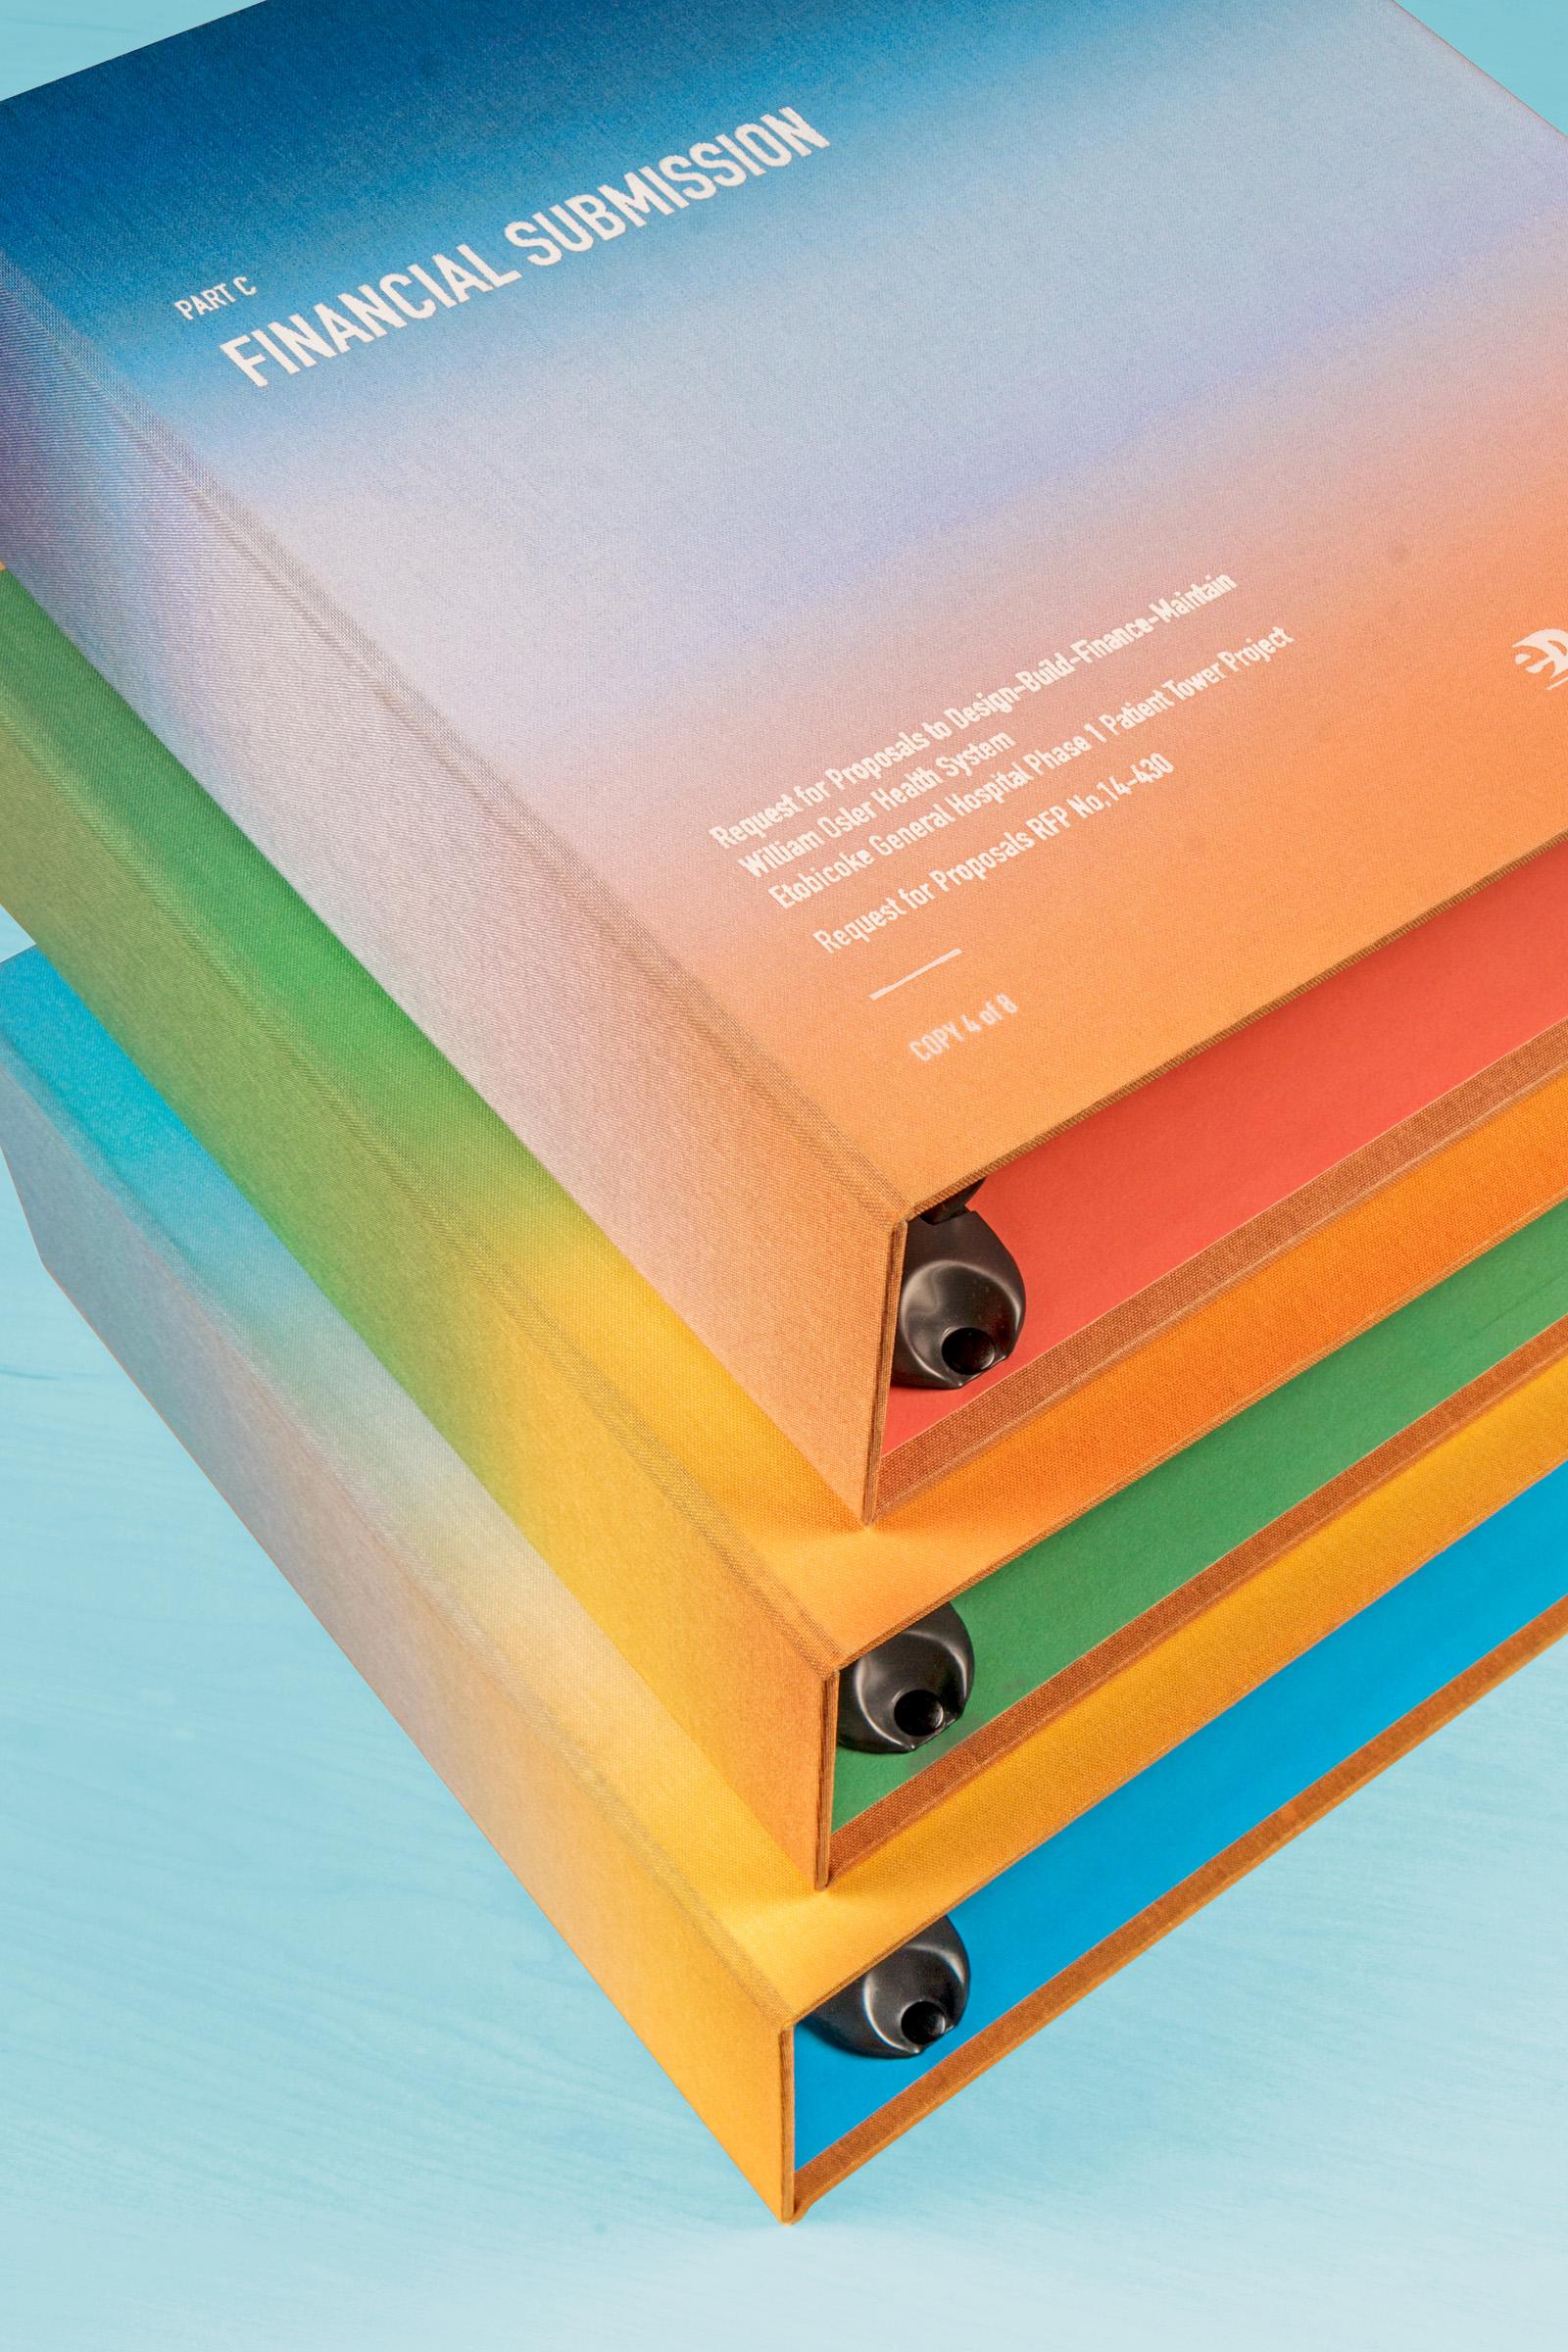 Gas Company EGH colour vignette three ring binders5.jpg